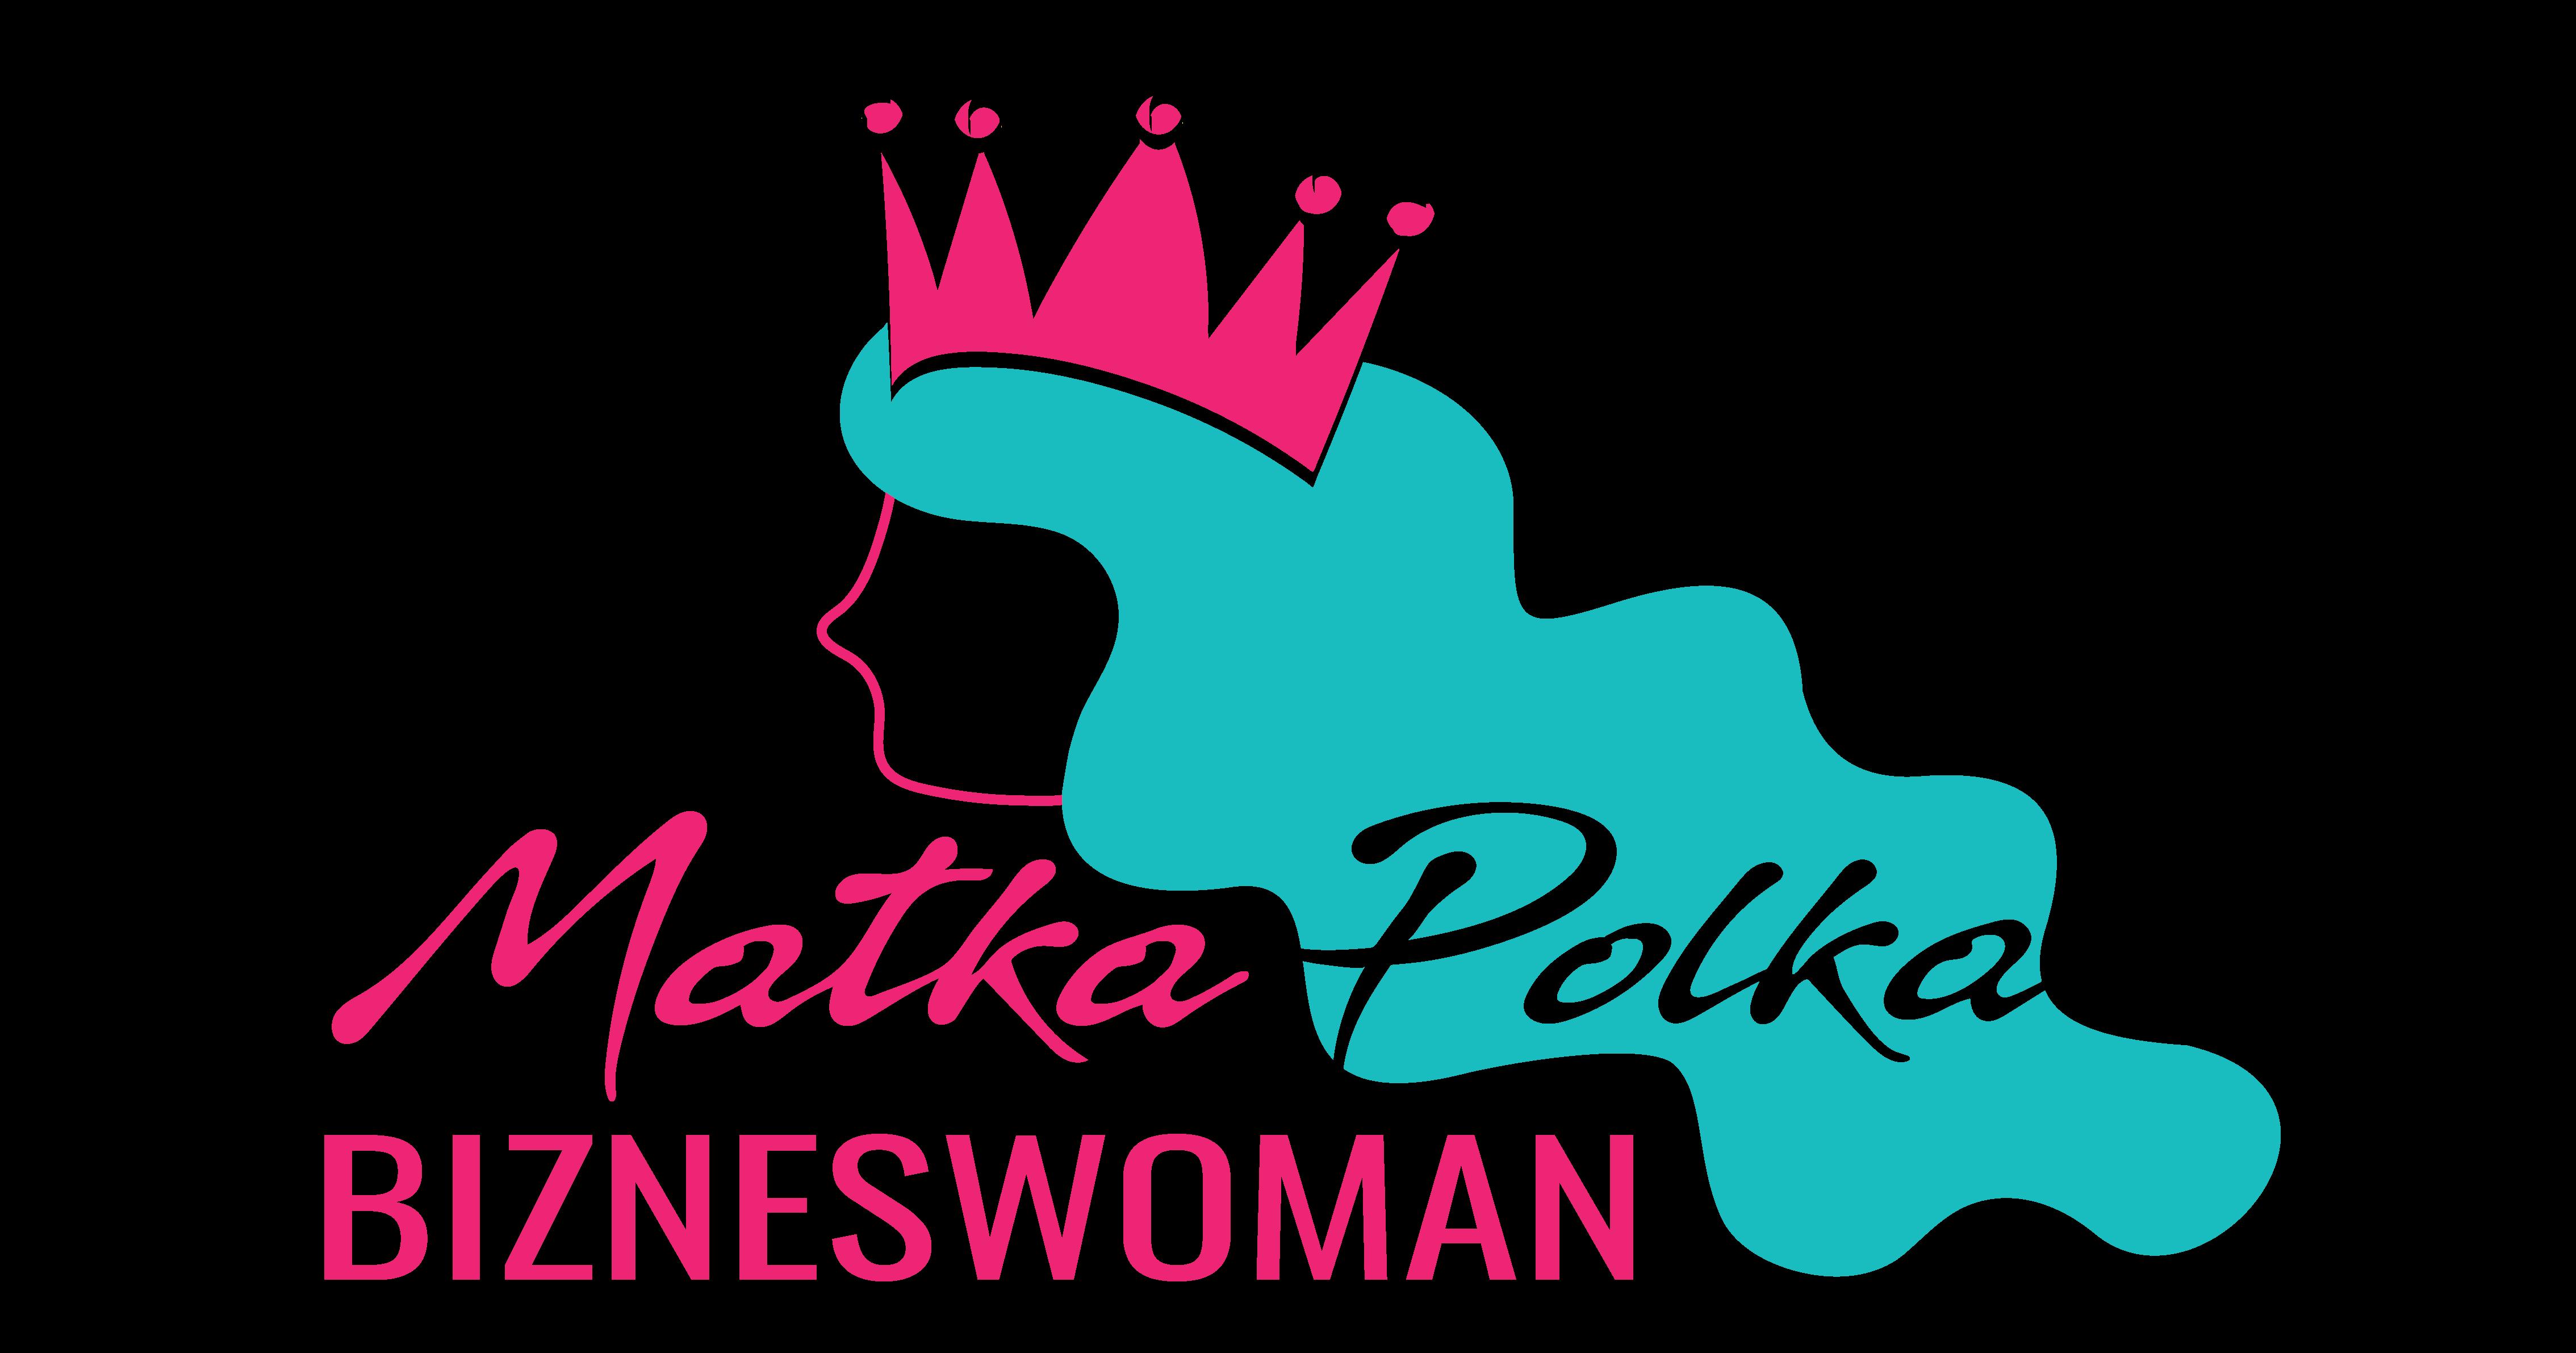 Matka Polka Bizneswoman